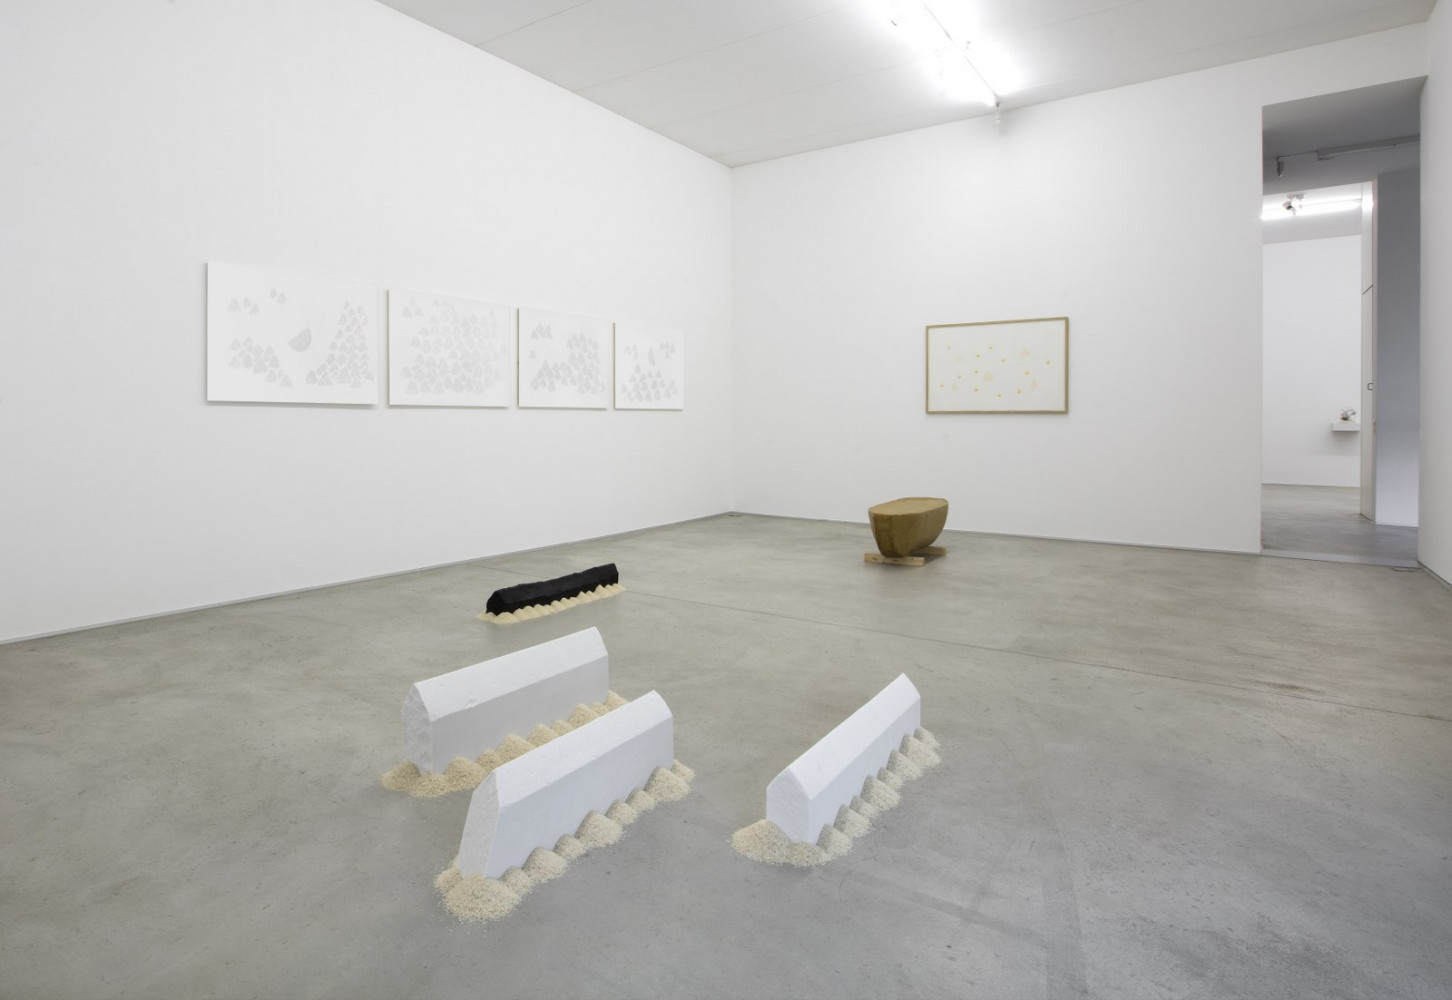 Wolfgang Laib, 'New installation', Installation view, Buchmann Lugano, 2017